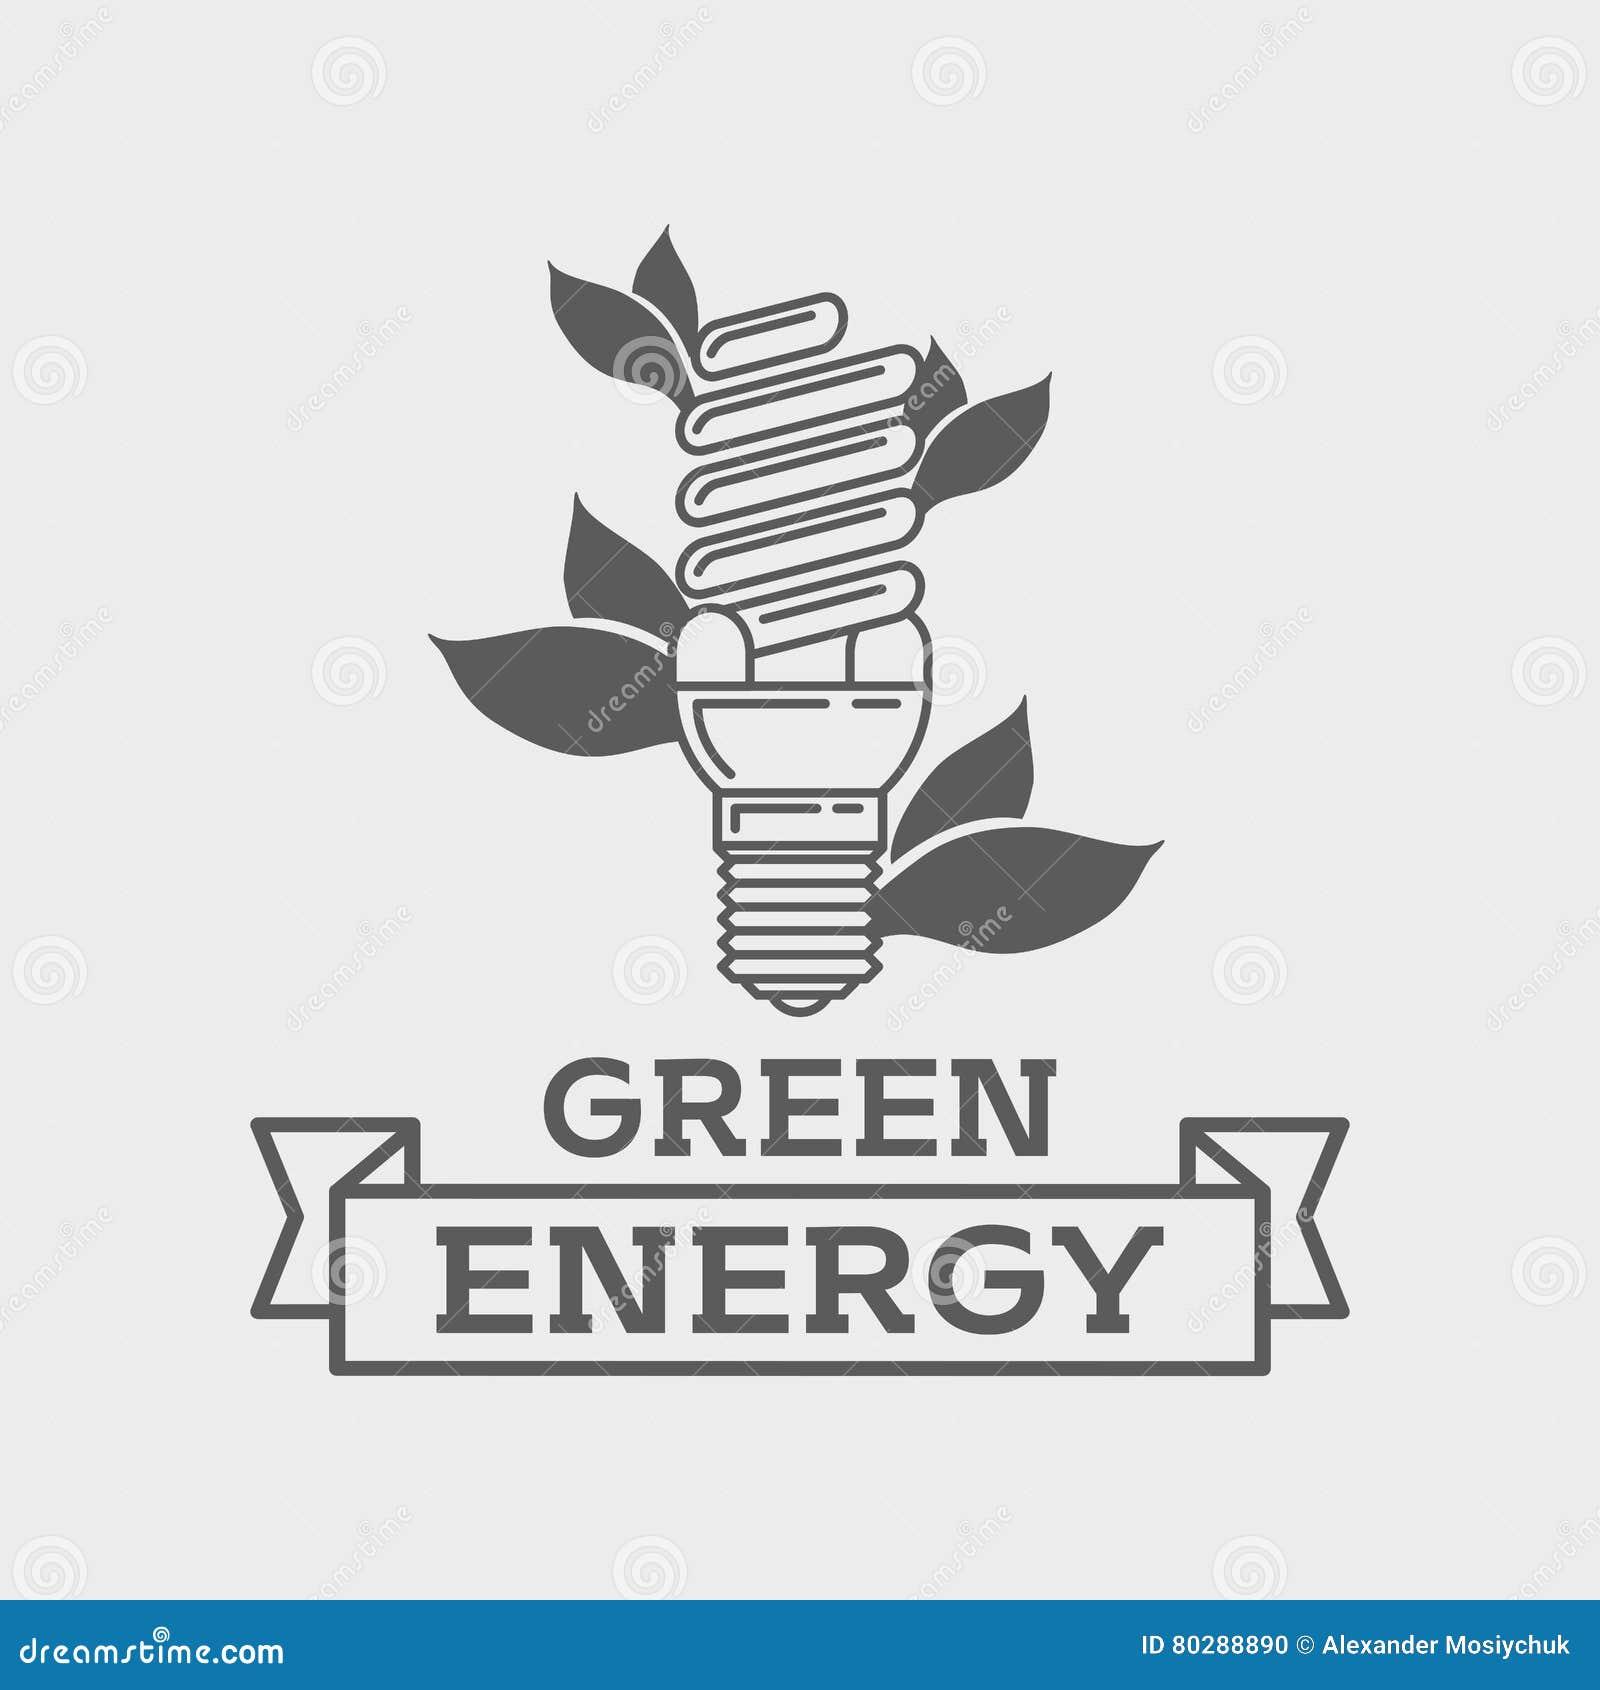 Efficient Fluorescent Light Bulb Logo Concept Green Energy Line Art